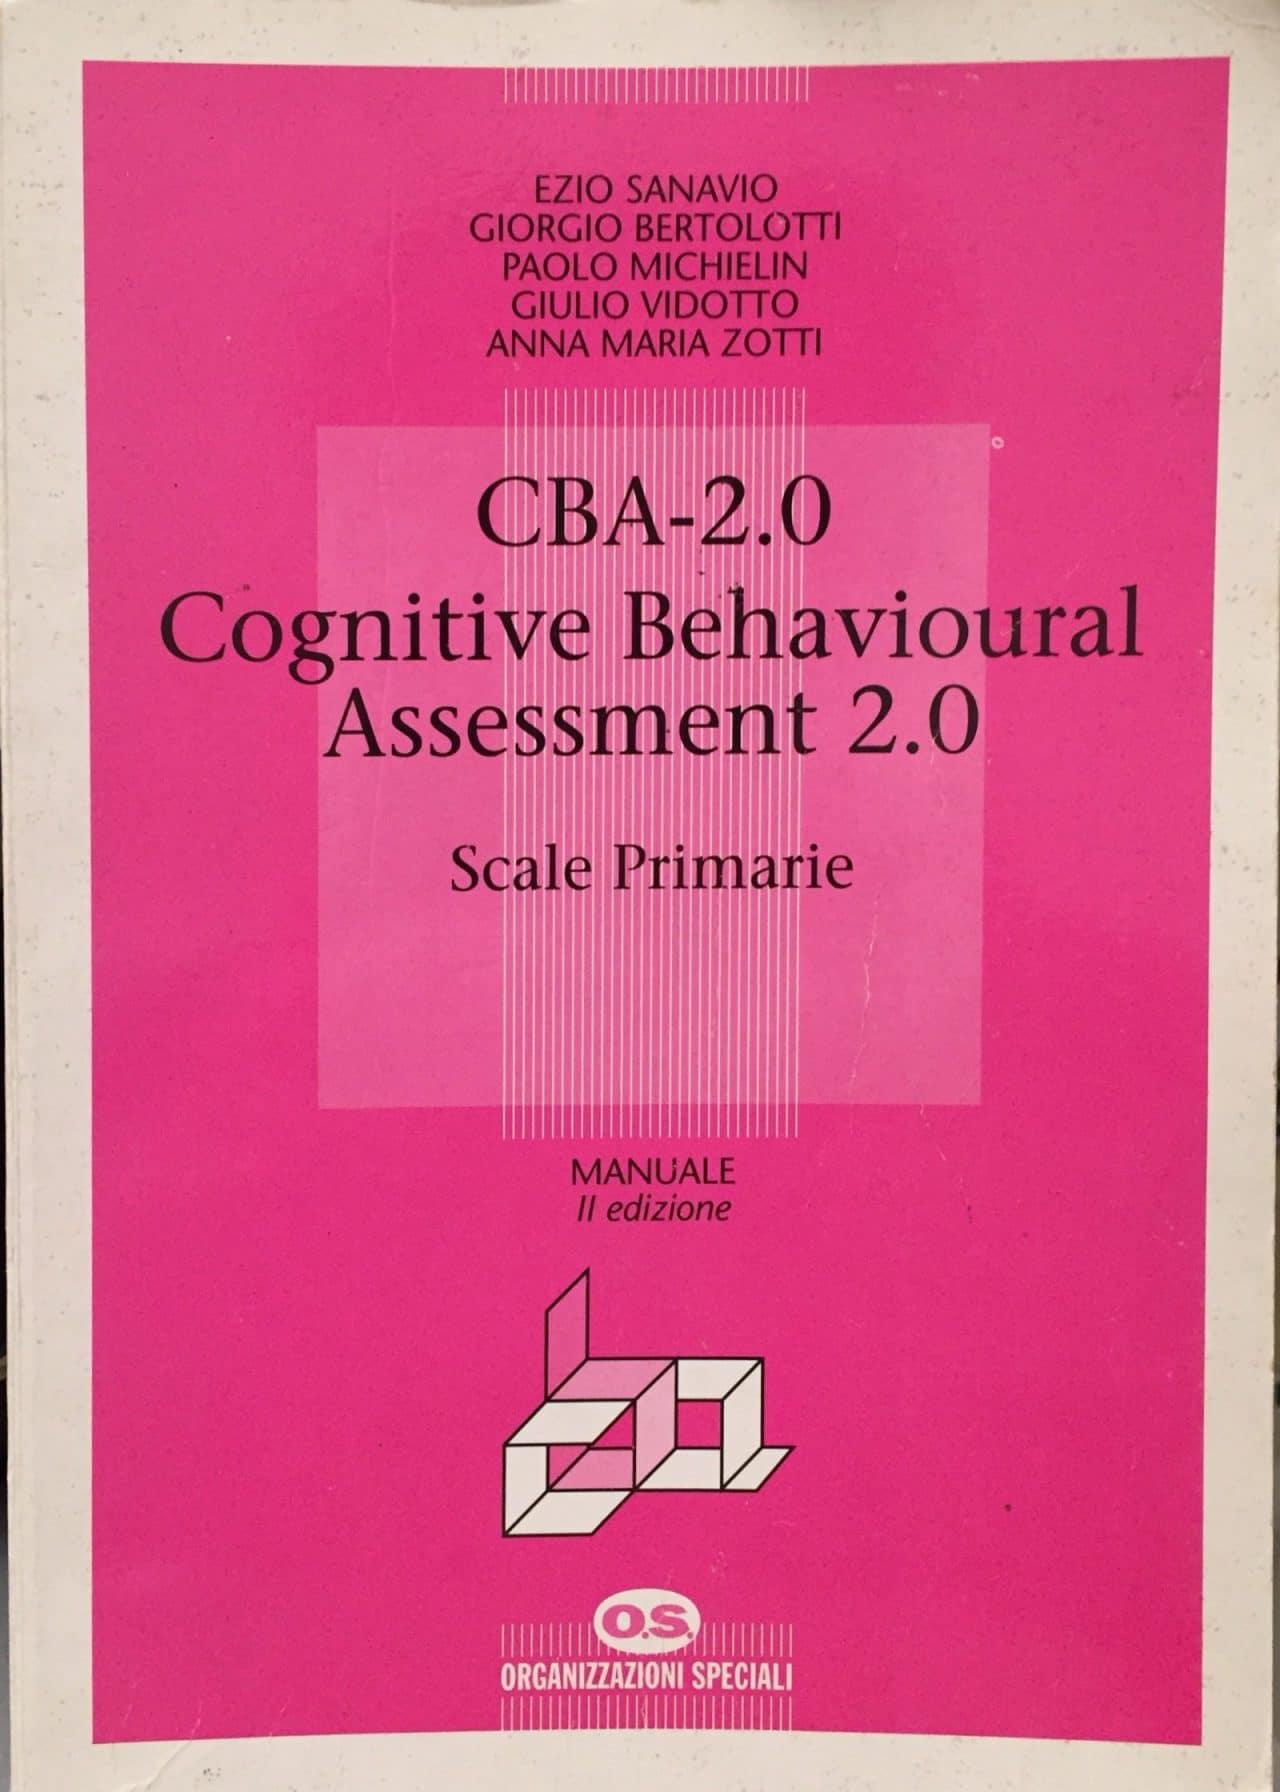 Cba-2.0 Cognitive Behavioural Assessment 2.0